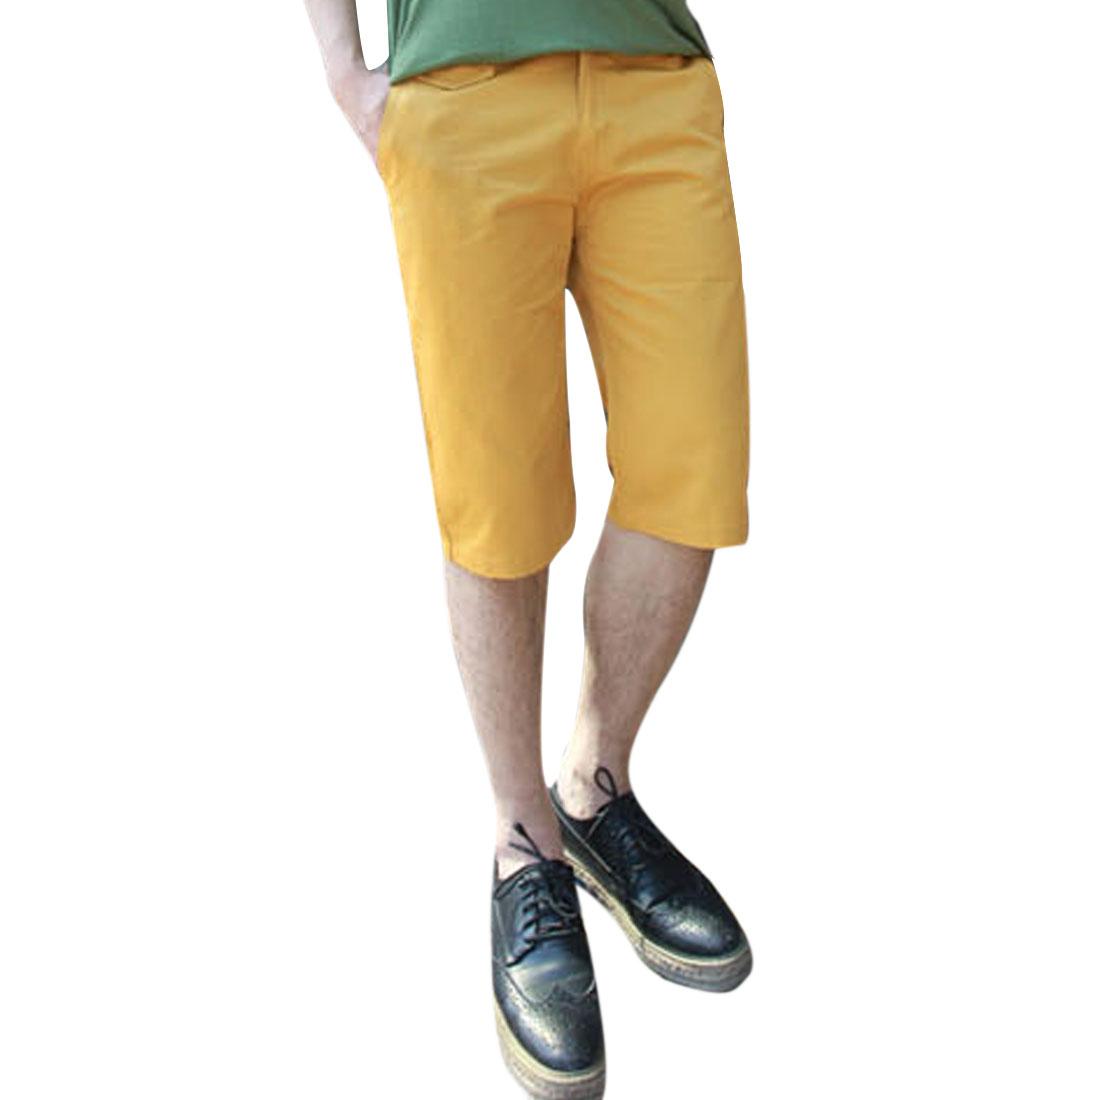 Man Stylish Slant Pockets Casual Solid Color Short Pants Yellow W36